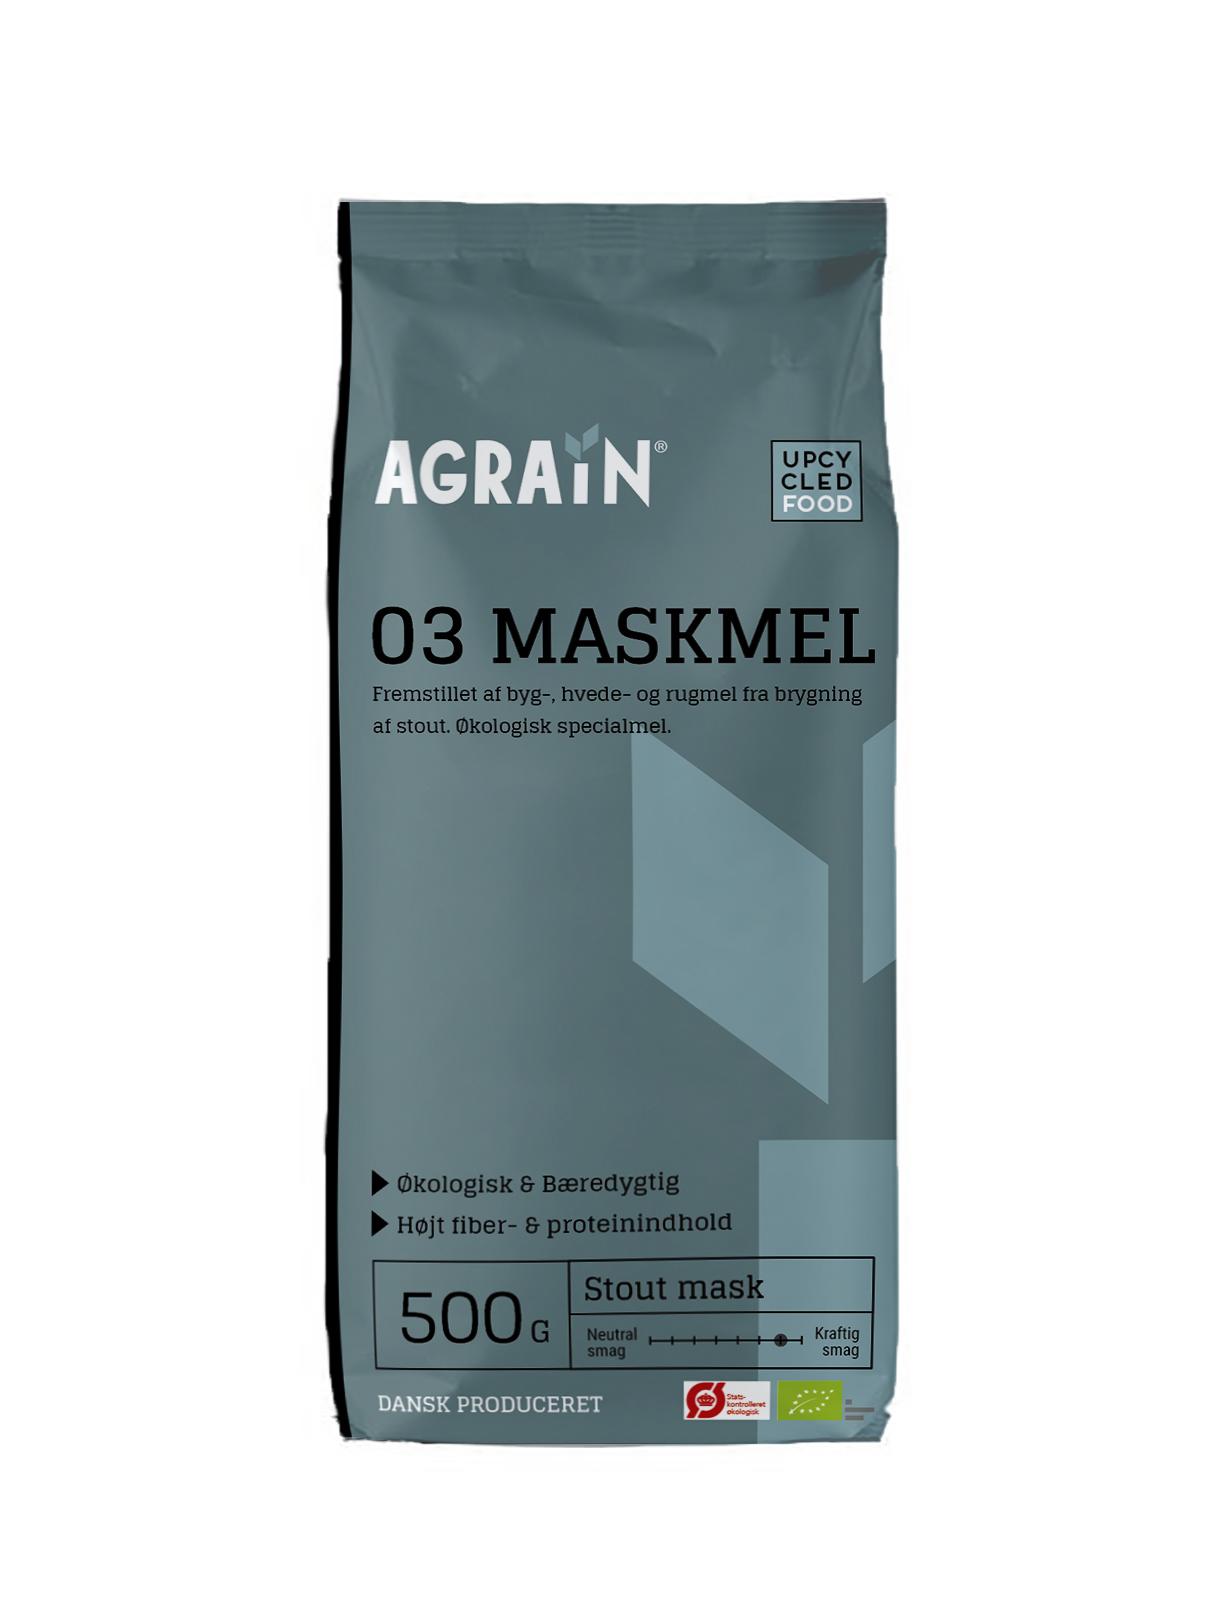 Agrain 03 Maskmel Stout